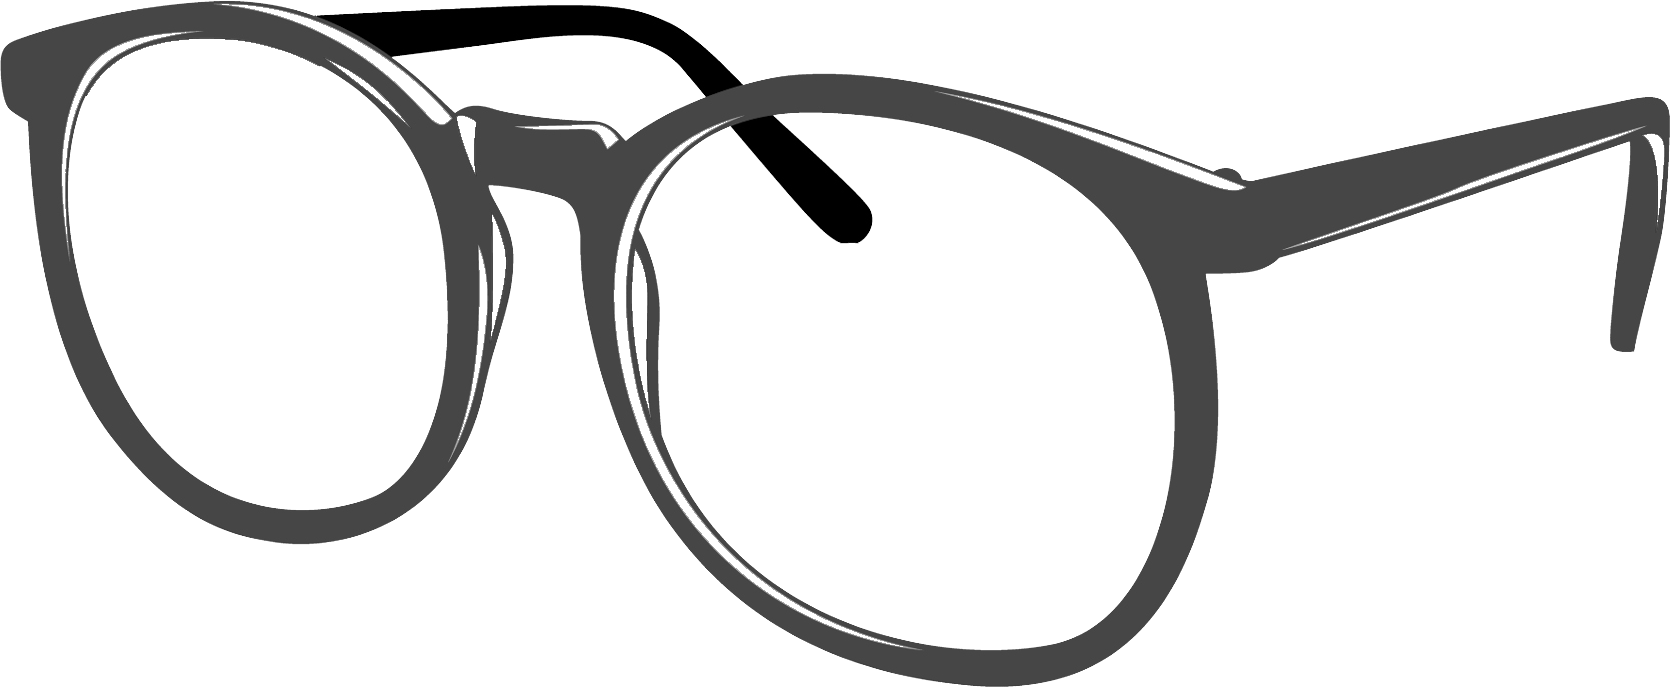 Sunglasses Images Free Glasses Png Image Free Glasses Glasses Cat Eye Glass